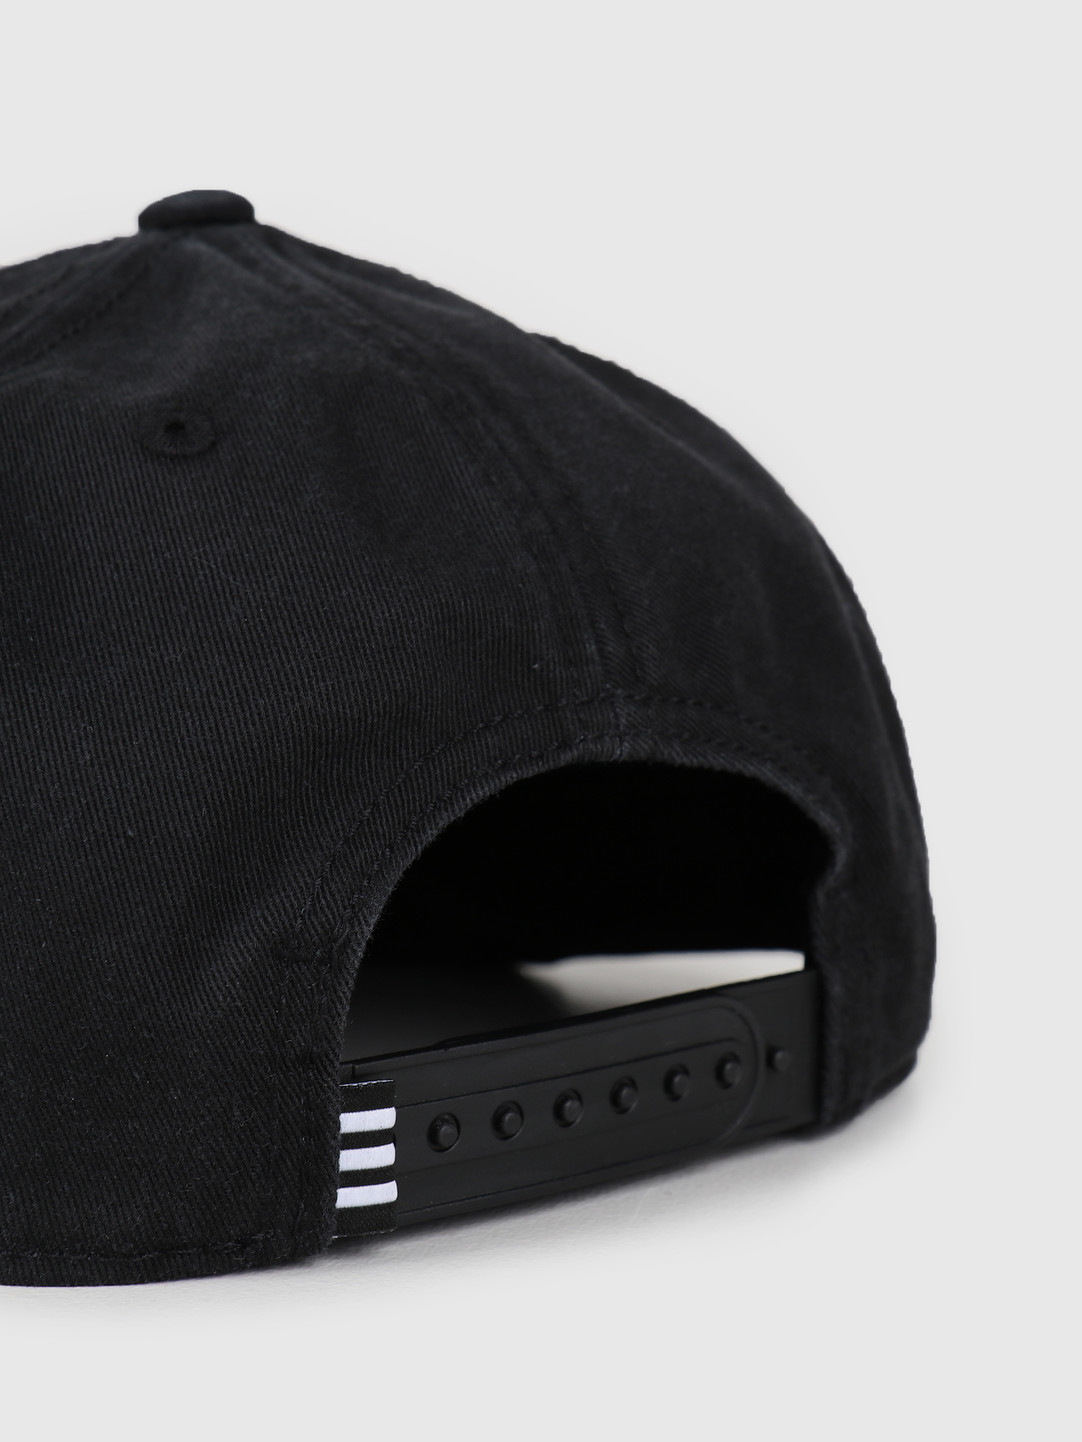 adidas adidas Ac Cap Tre Flat Black White DV0236